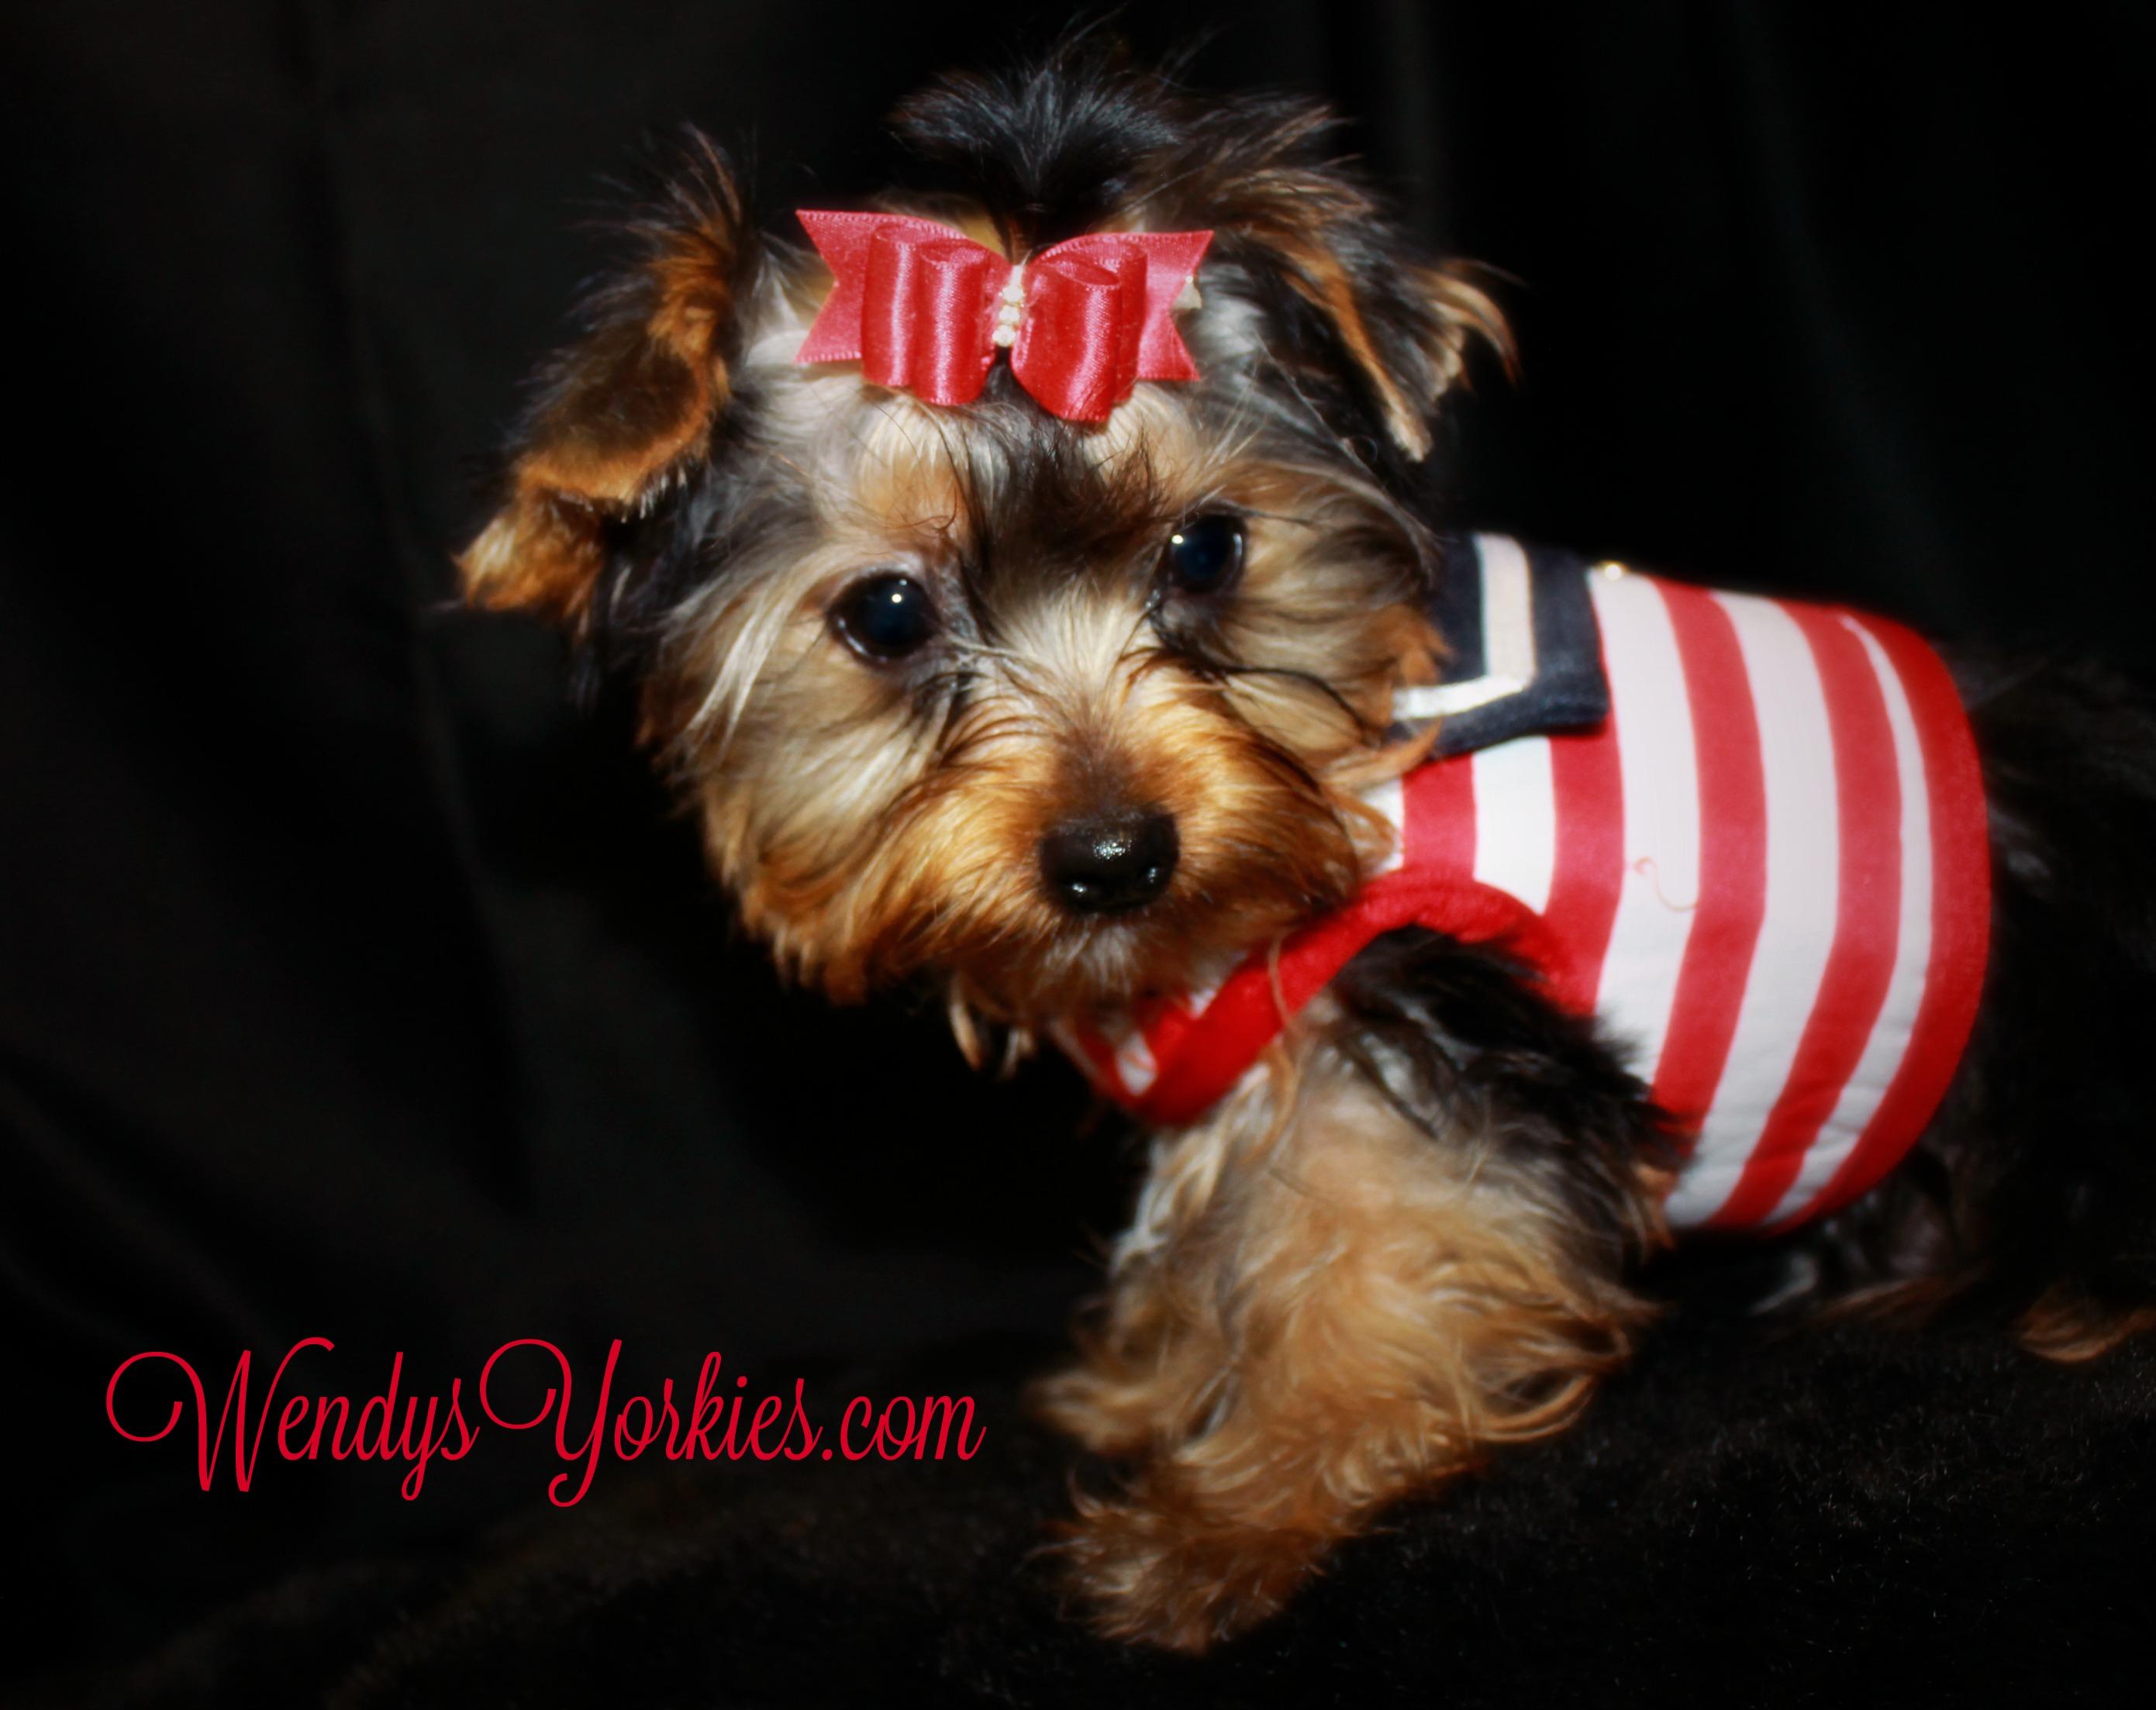 Male Yorkie puppy for sale, WendysYorkies.com, StarAce